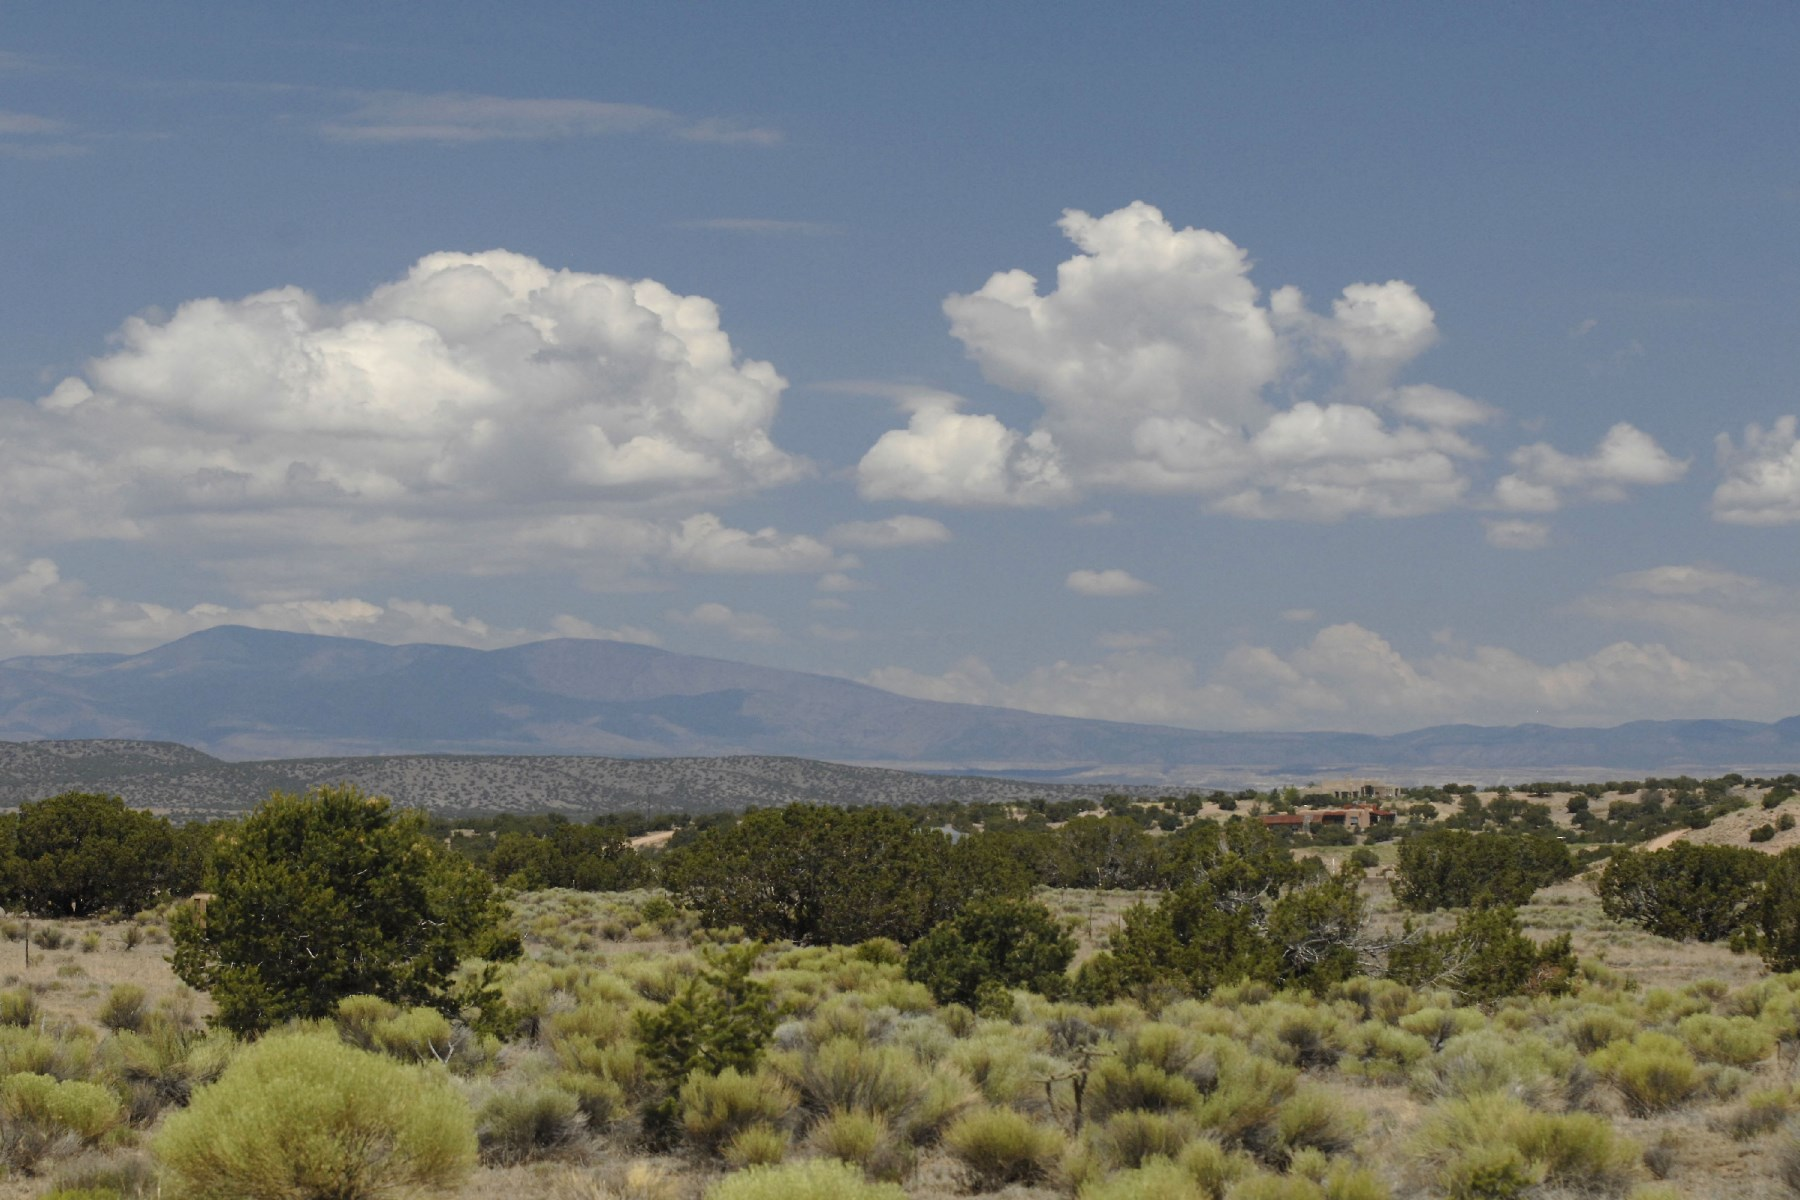 Land for Sale at 151 Paseo Aragon, #64 Las Campanas & Los Santeros, Santa Fe, New Mexico, 87506 United States